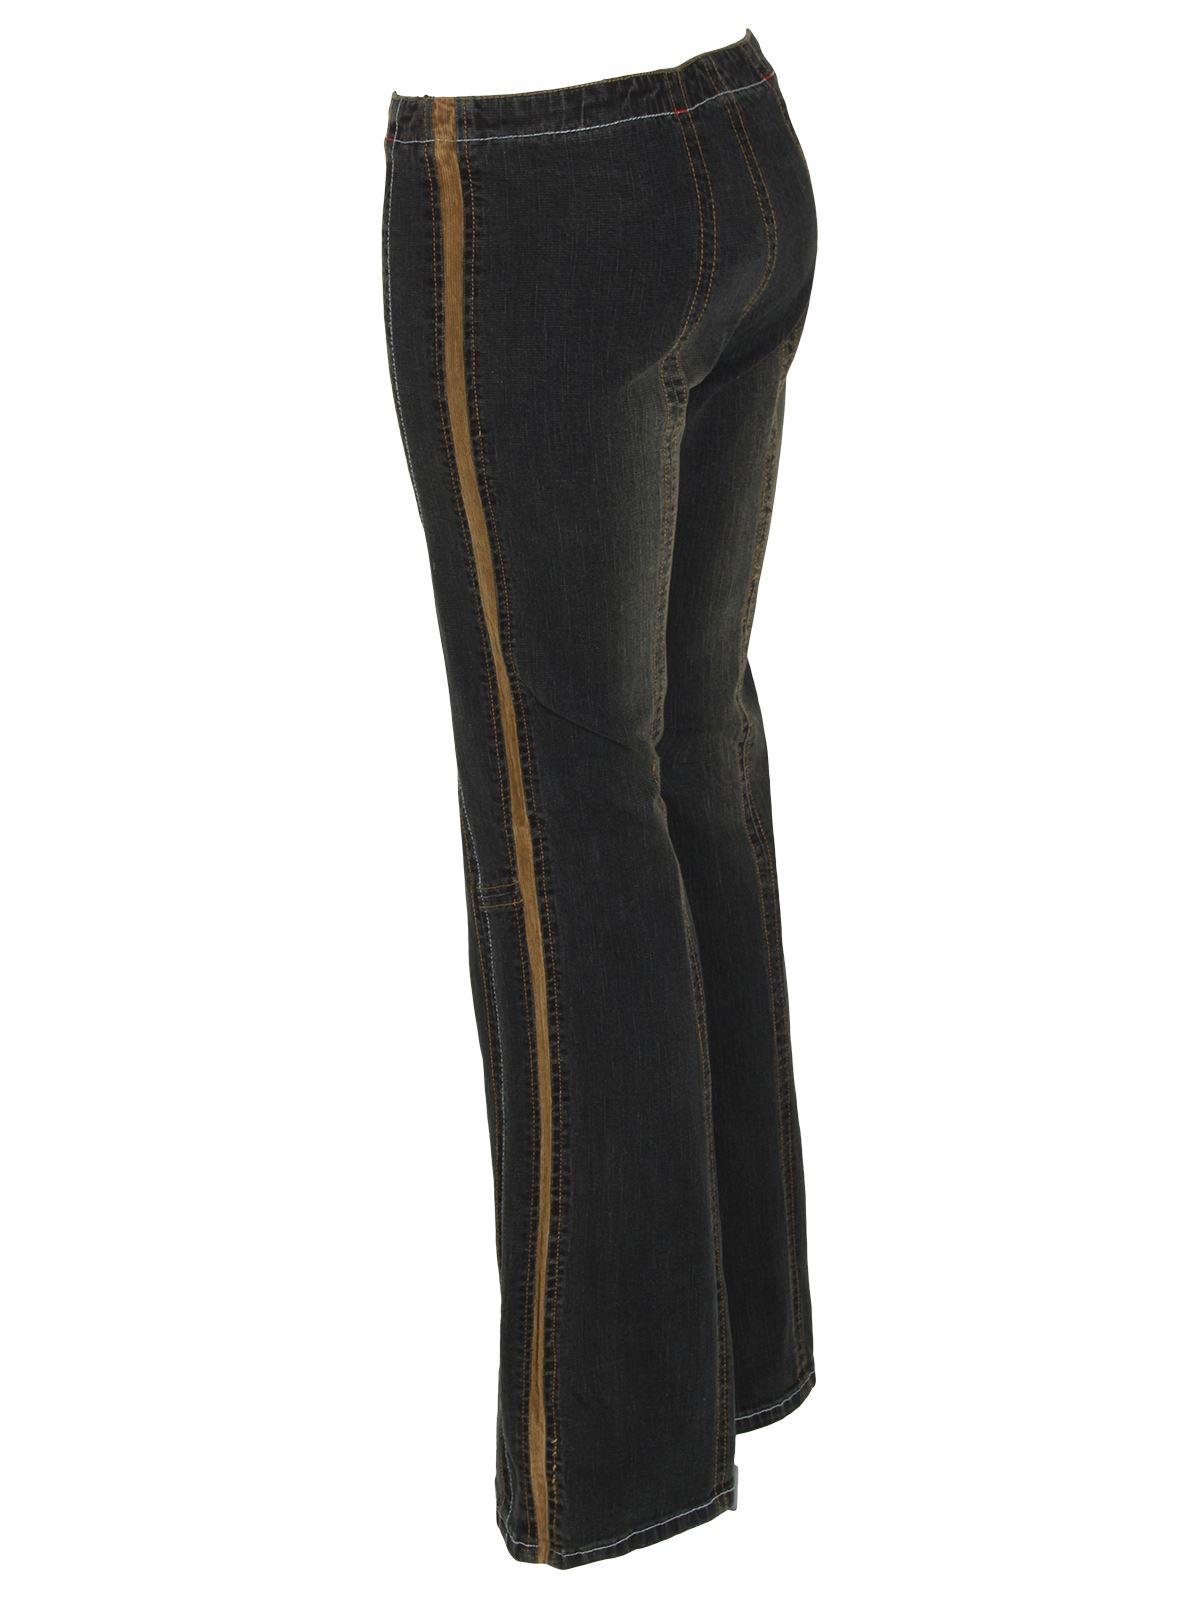 Amazing Vintage 80s 90s High Waist Leviu0026#39;s 512 Tapered Leg Jeans